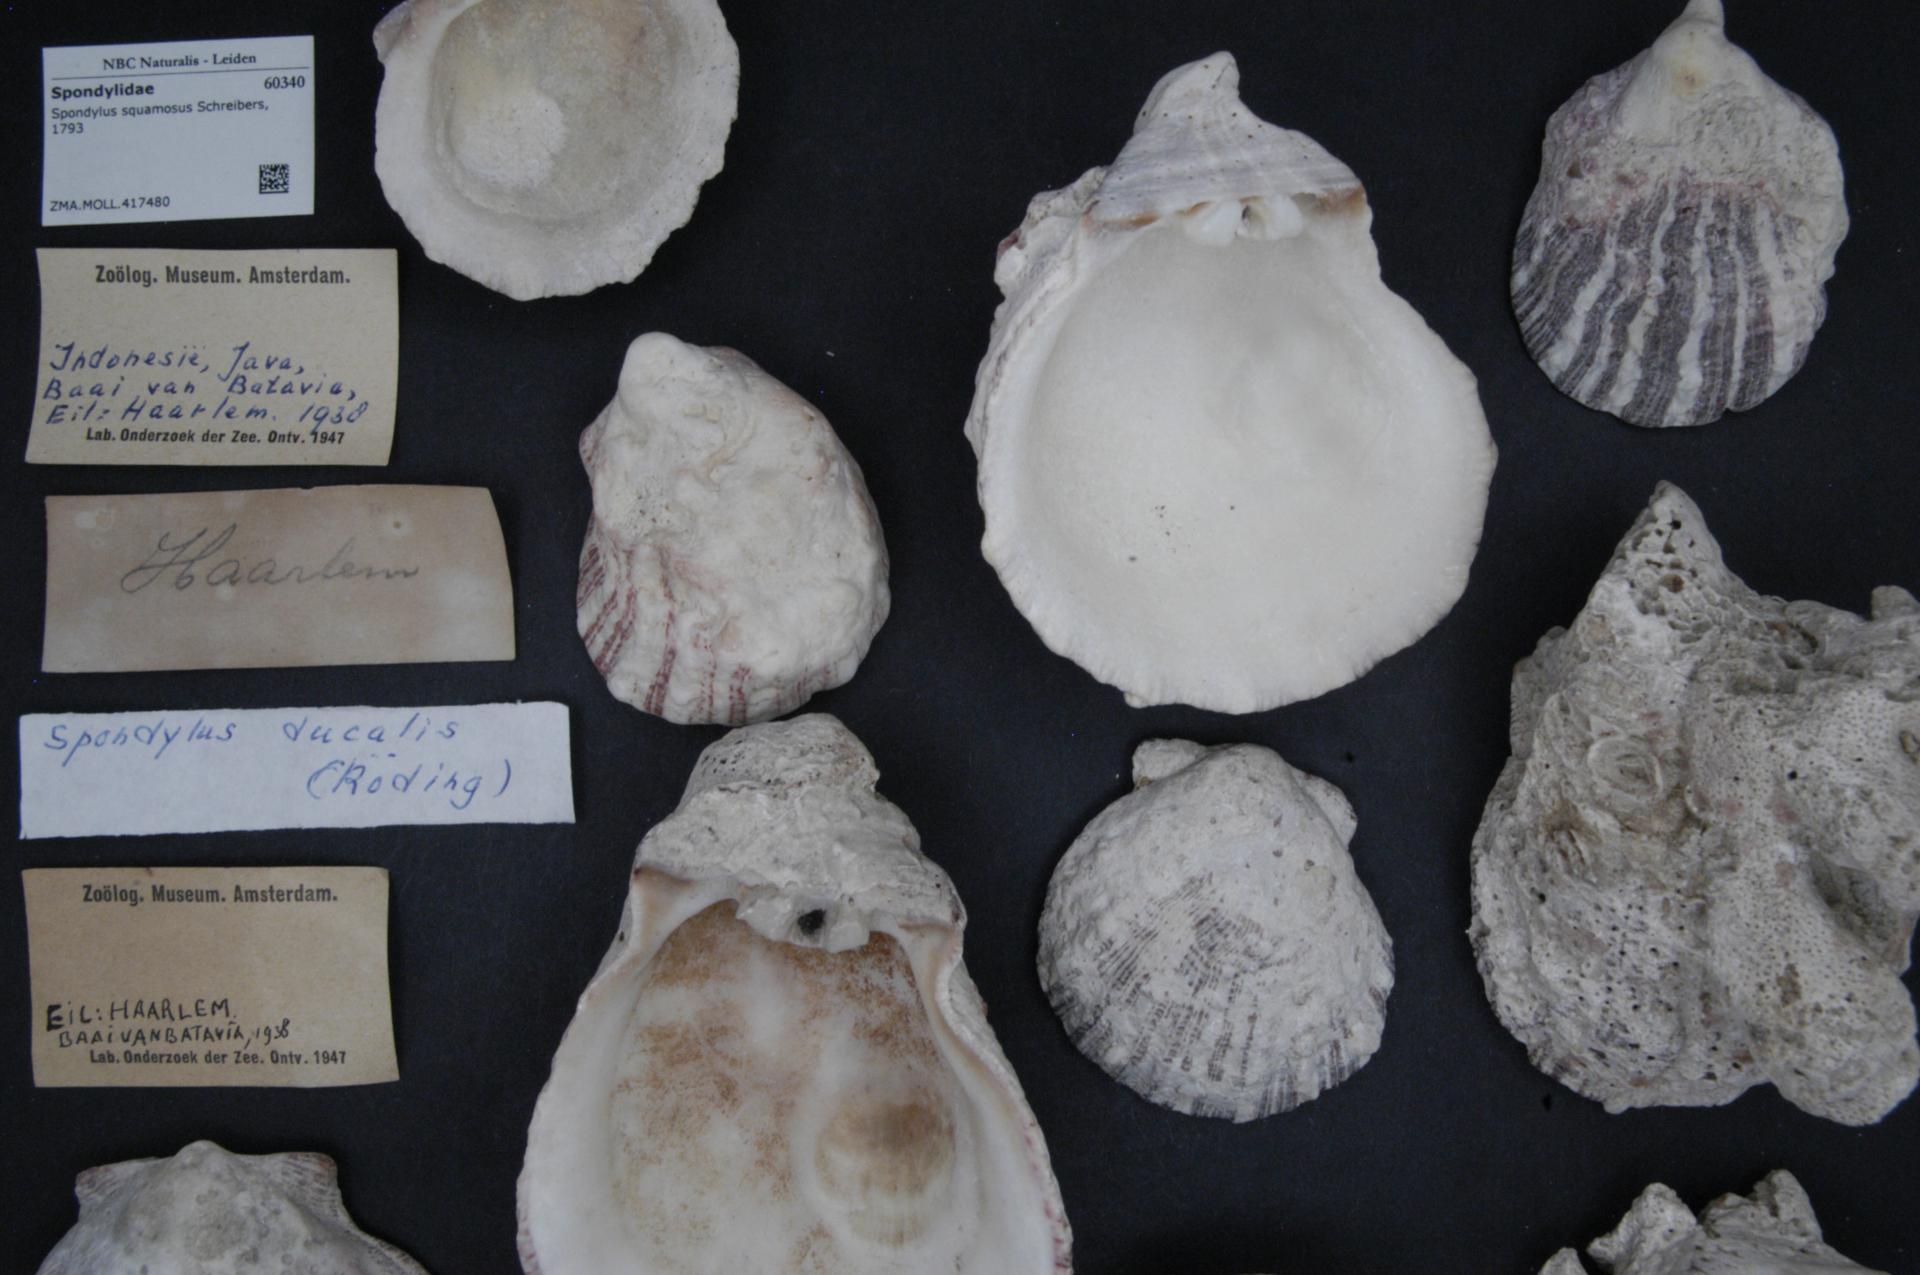 ZMA.MOLL.417480 | Spondylus squamosus Schreibers, 1793